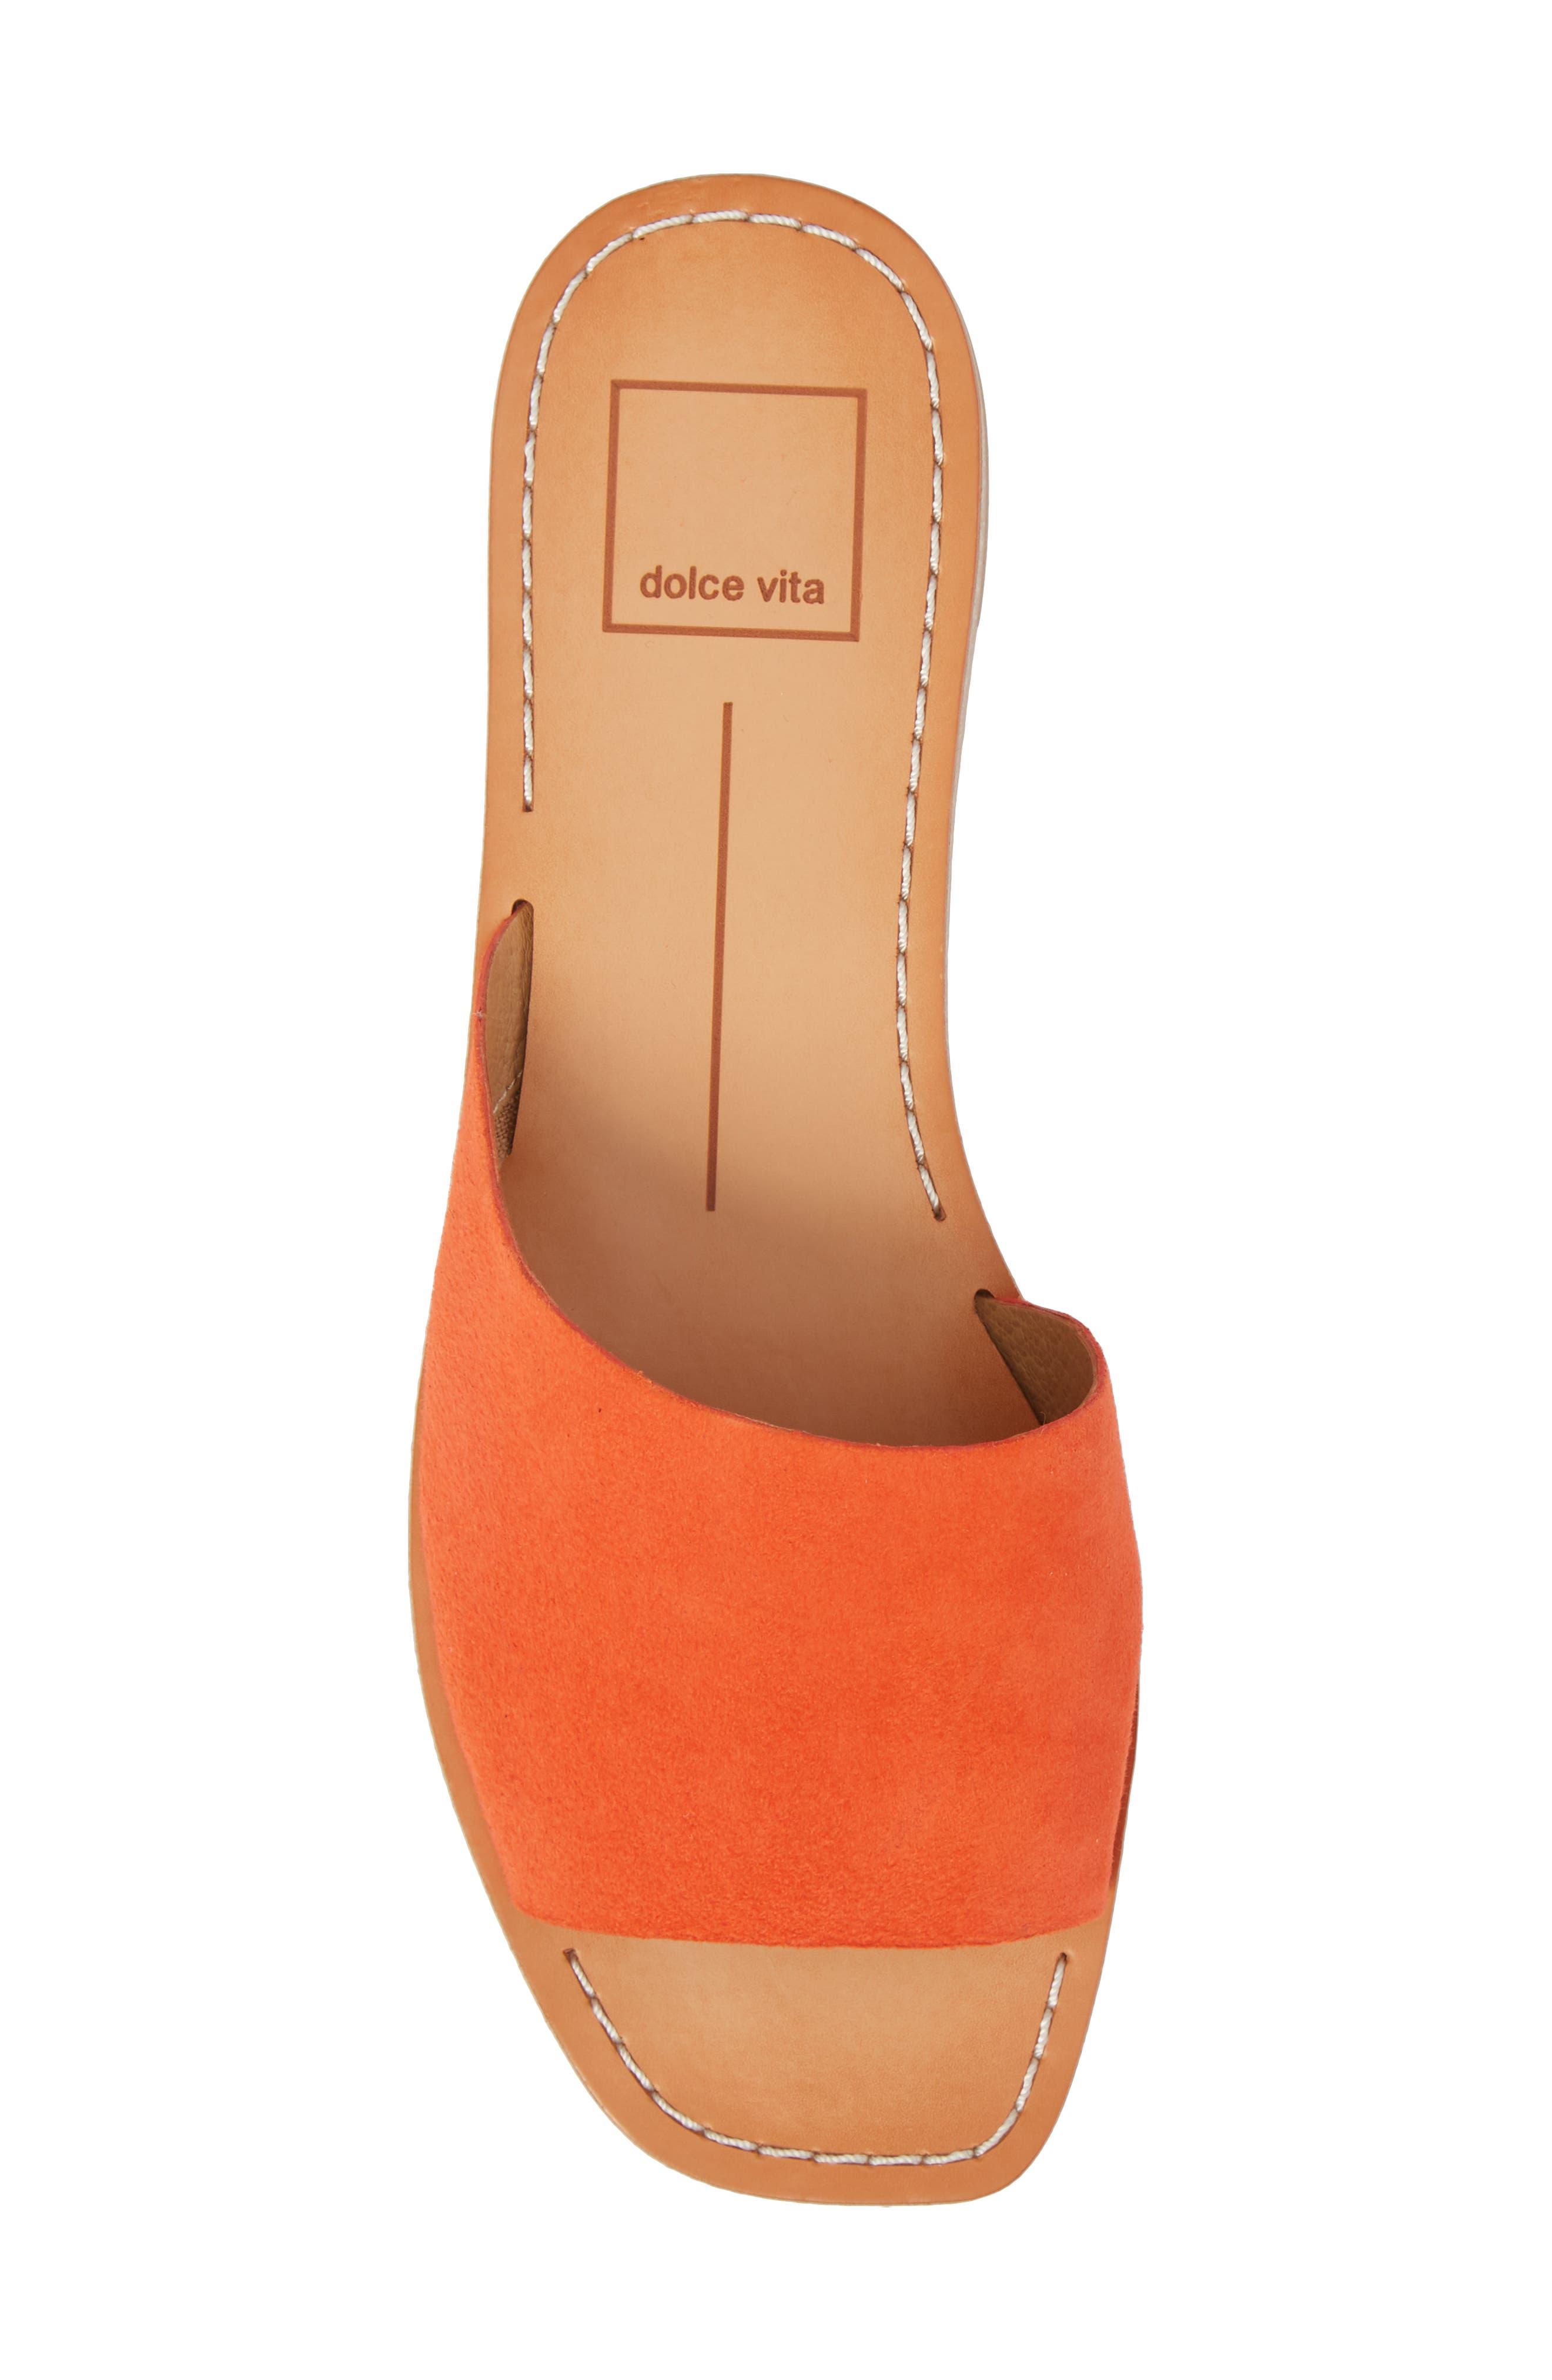 Cato Asymmetrical Slide Sandal,                             Alternate thumbnail 5, color,                             Orange Suede